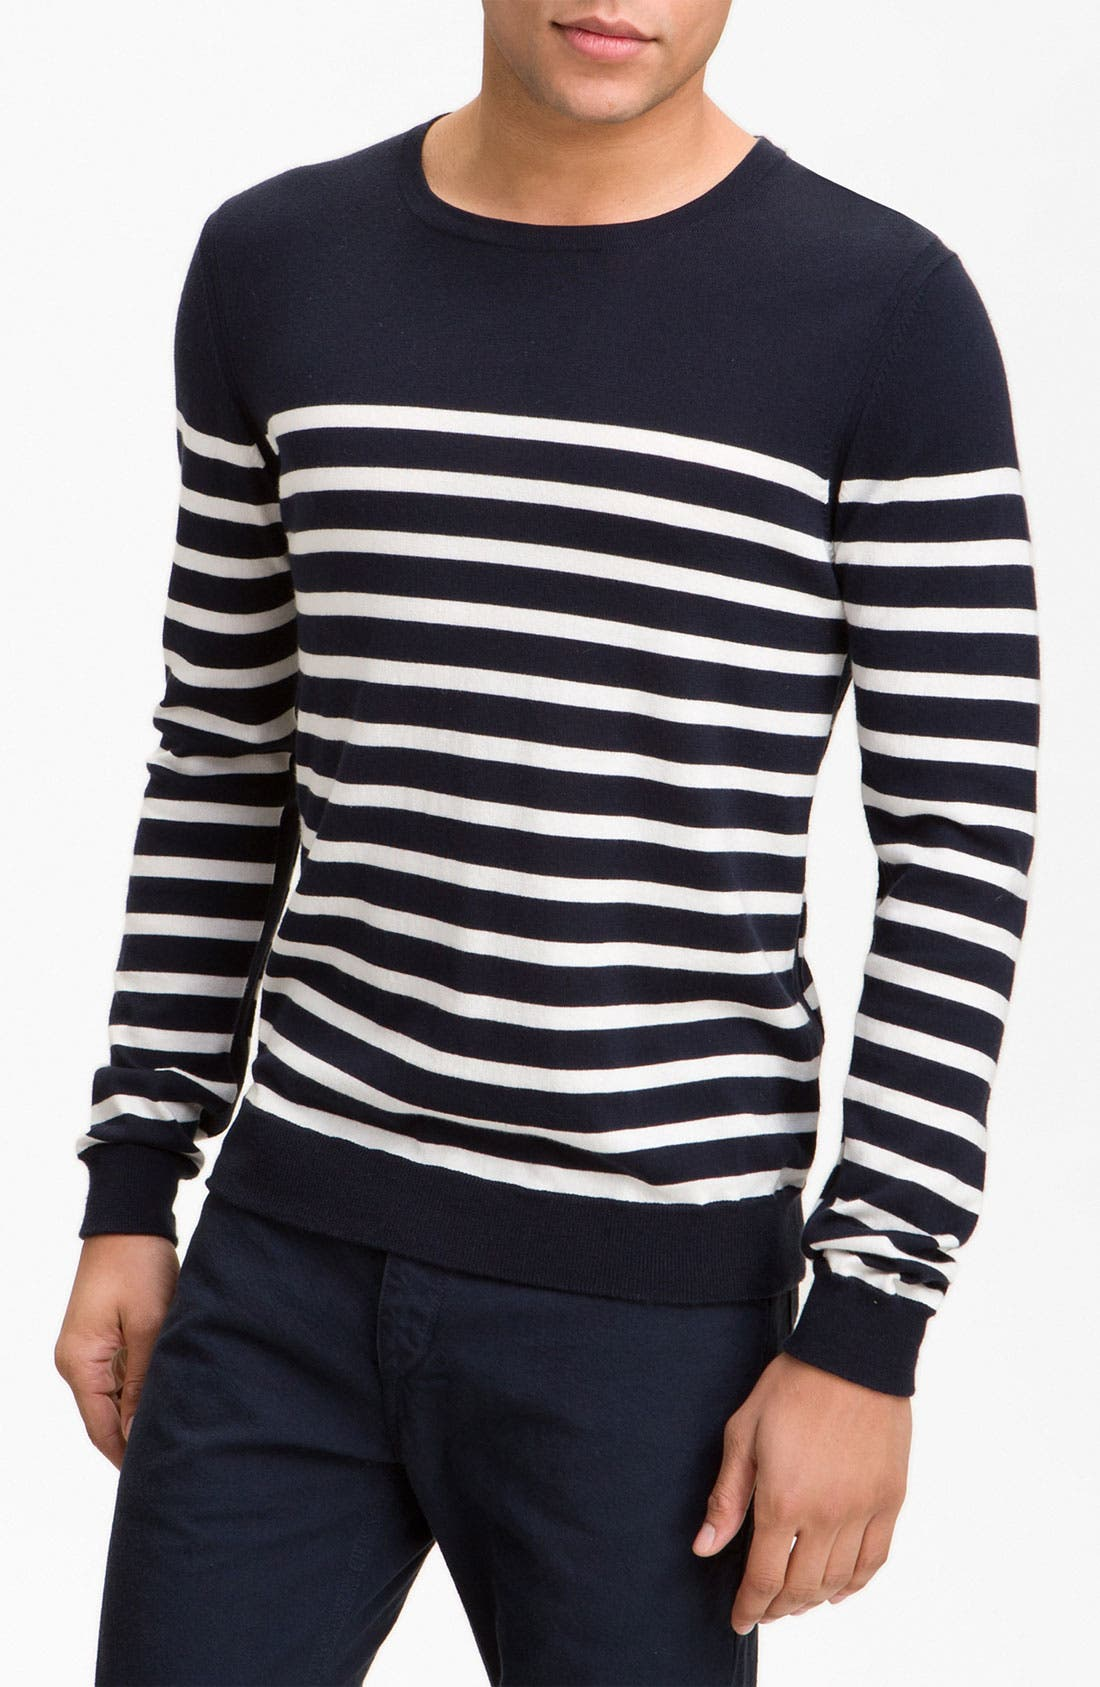 Alternate Image 1 Selected - rag & bone 'Basque' Crewneck Sweater